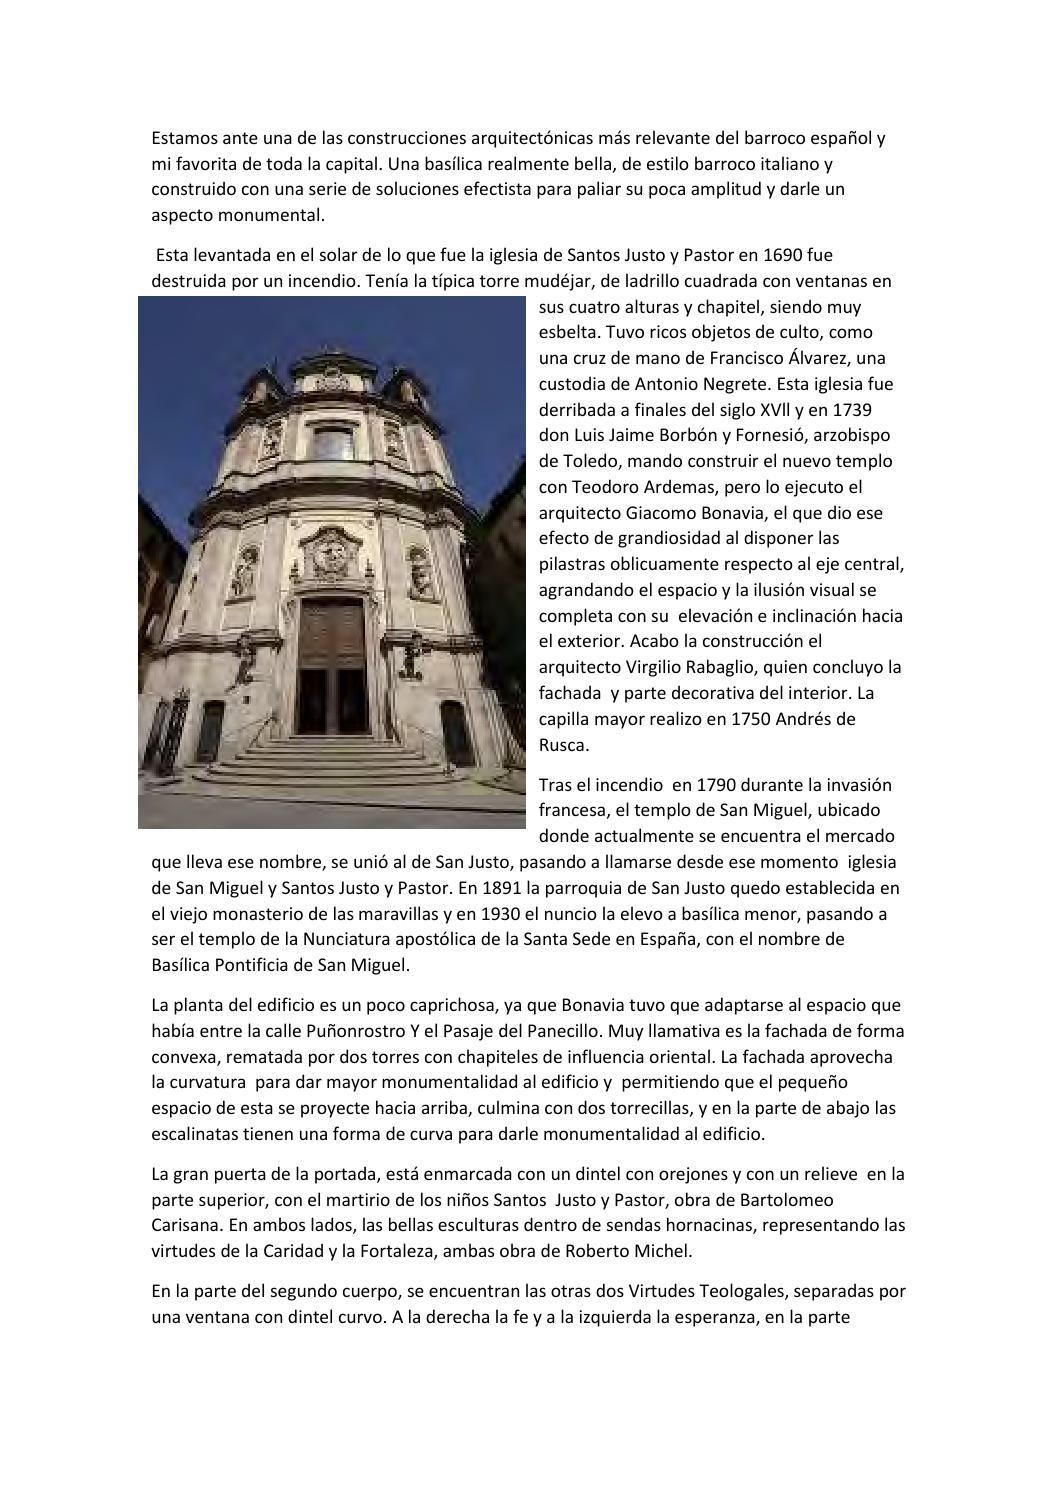 Historia de la arquitectura iv 2014 by arq octavio for Arquitectura que se estudia